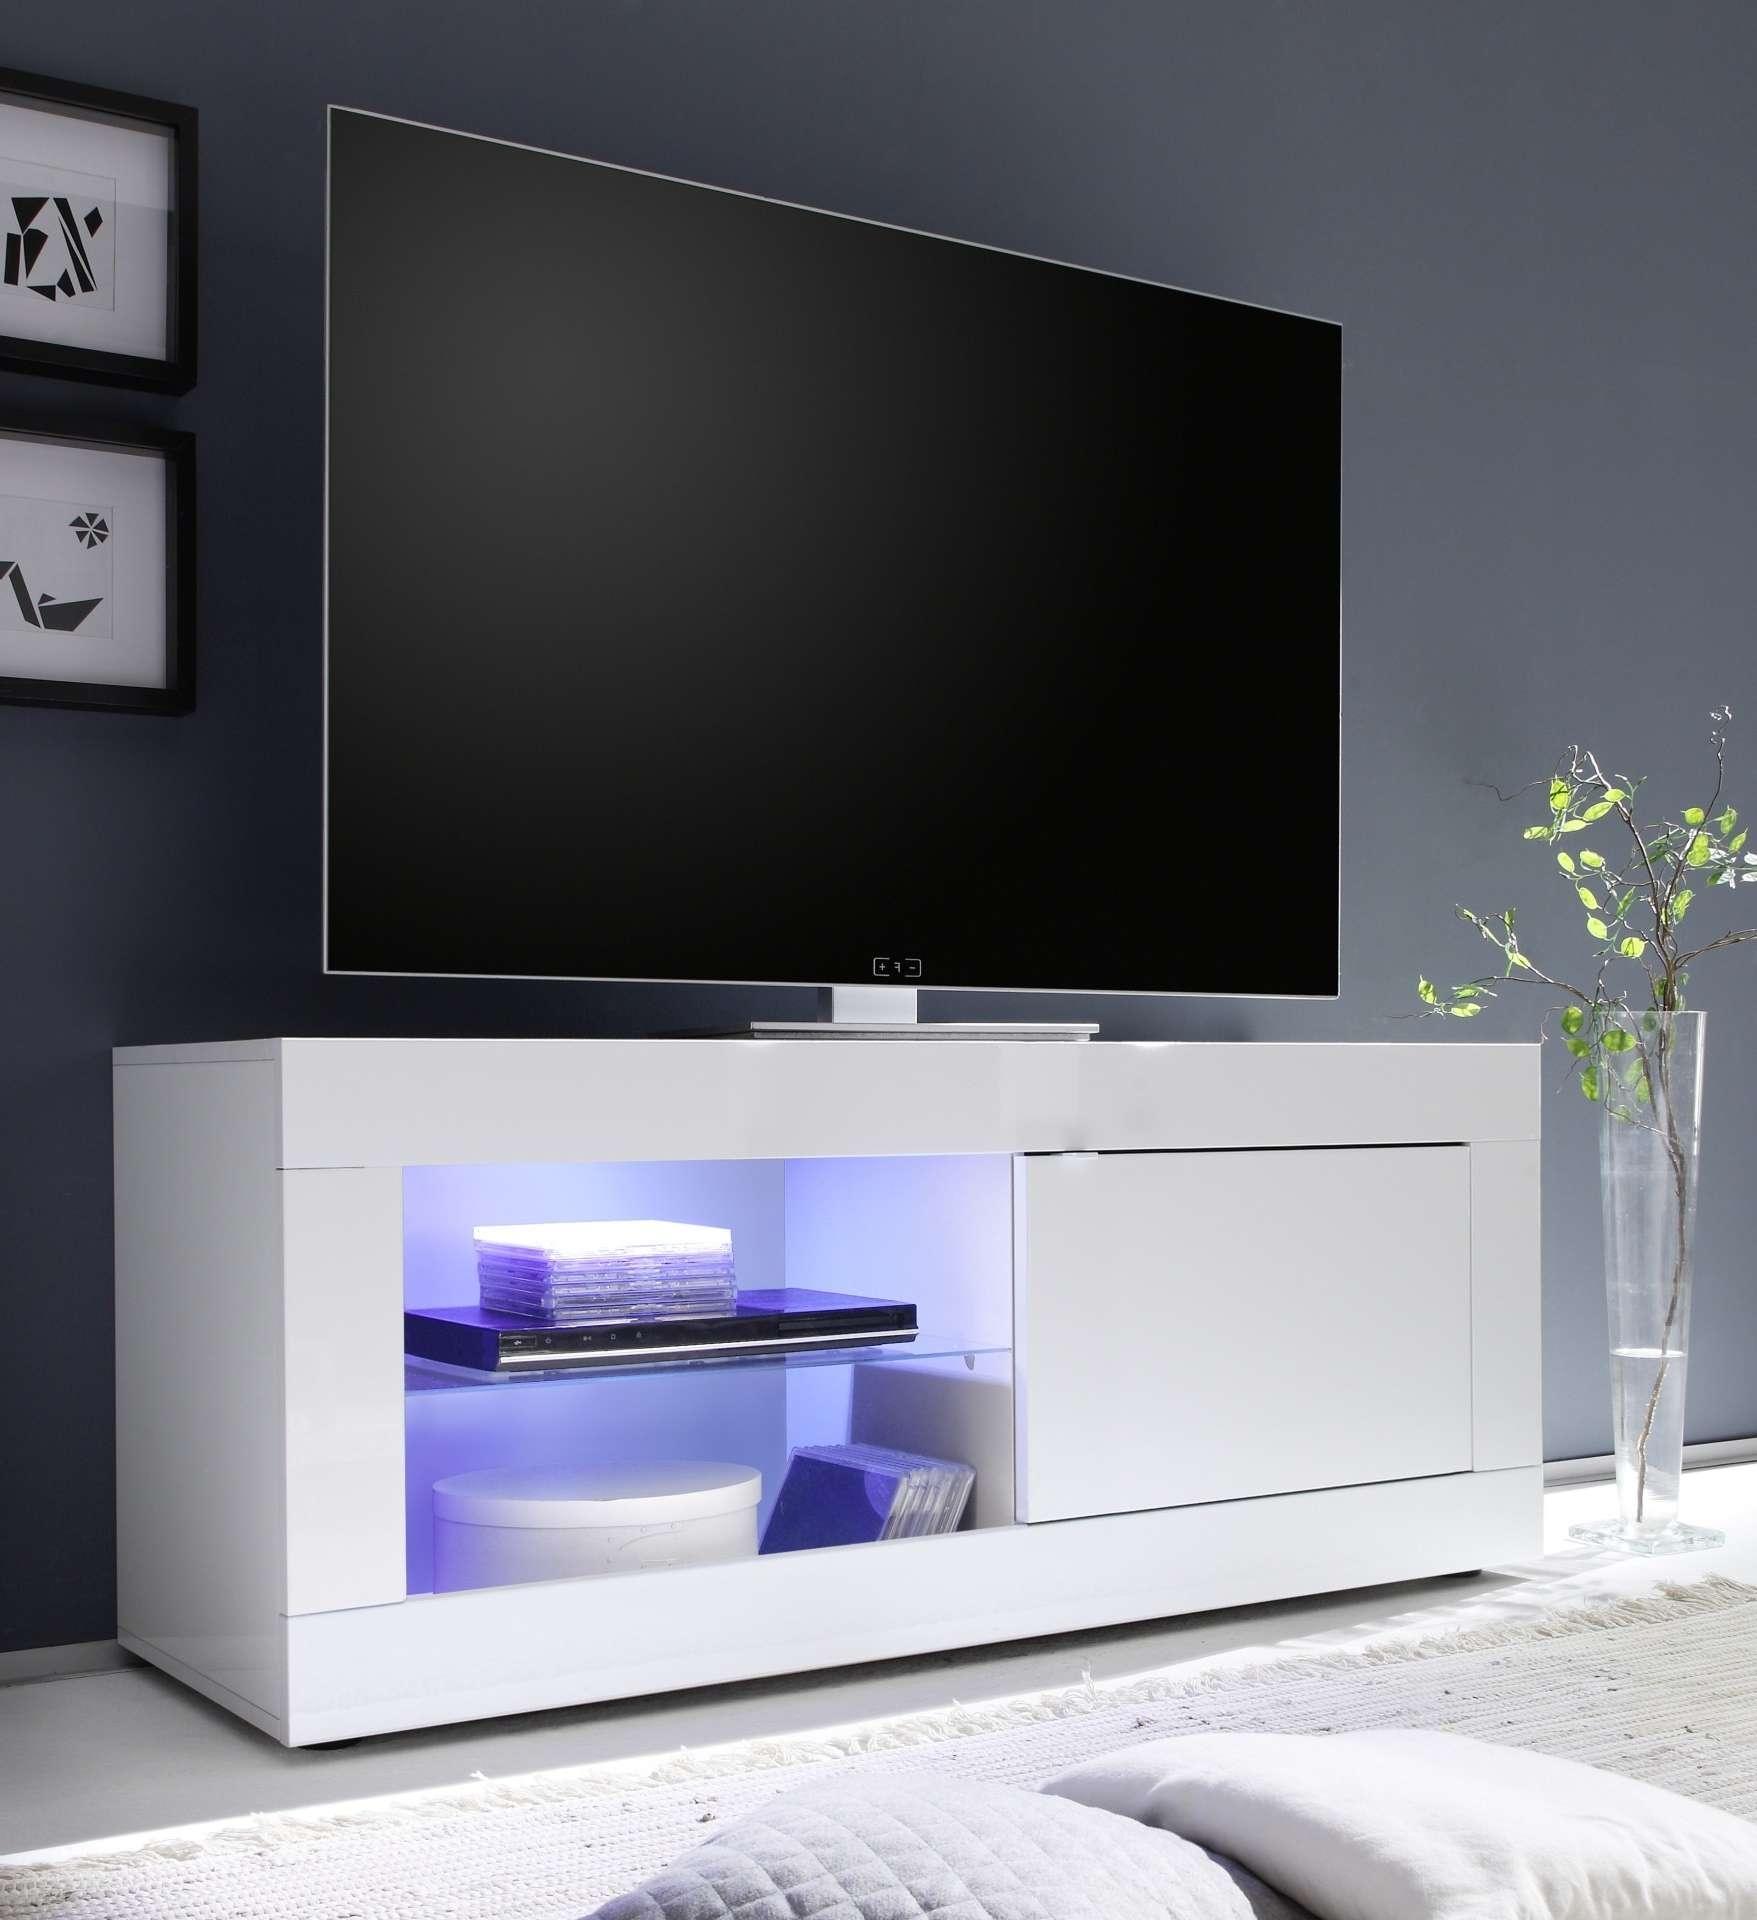 Tall Corner Tv Stand White (View 6 of 20)